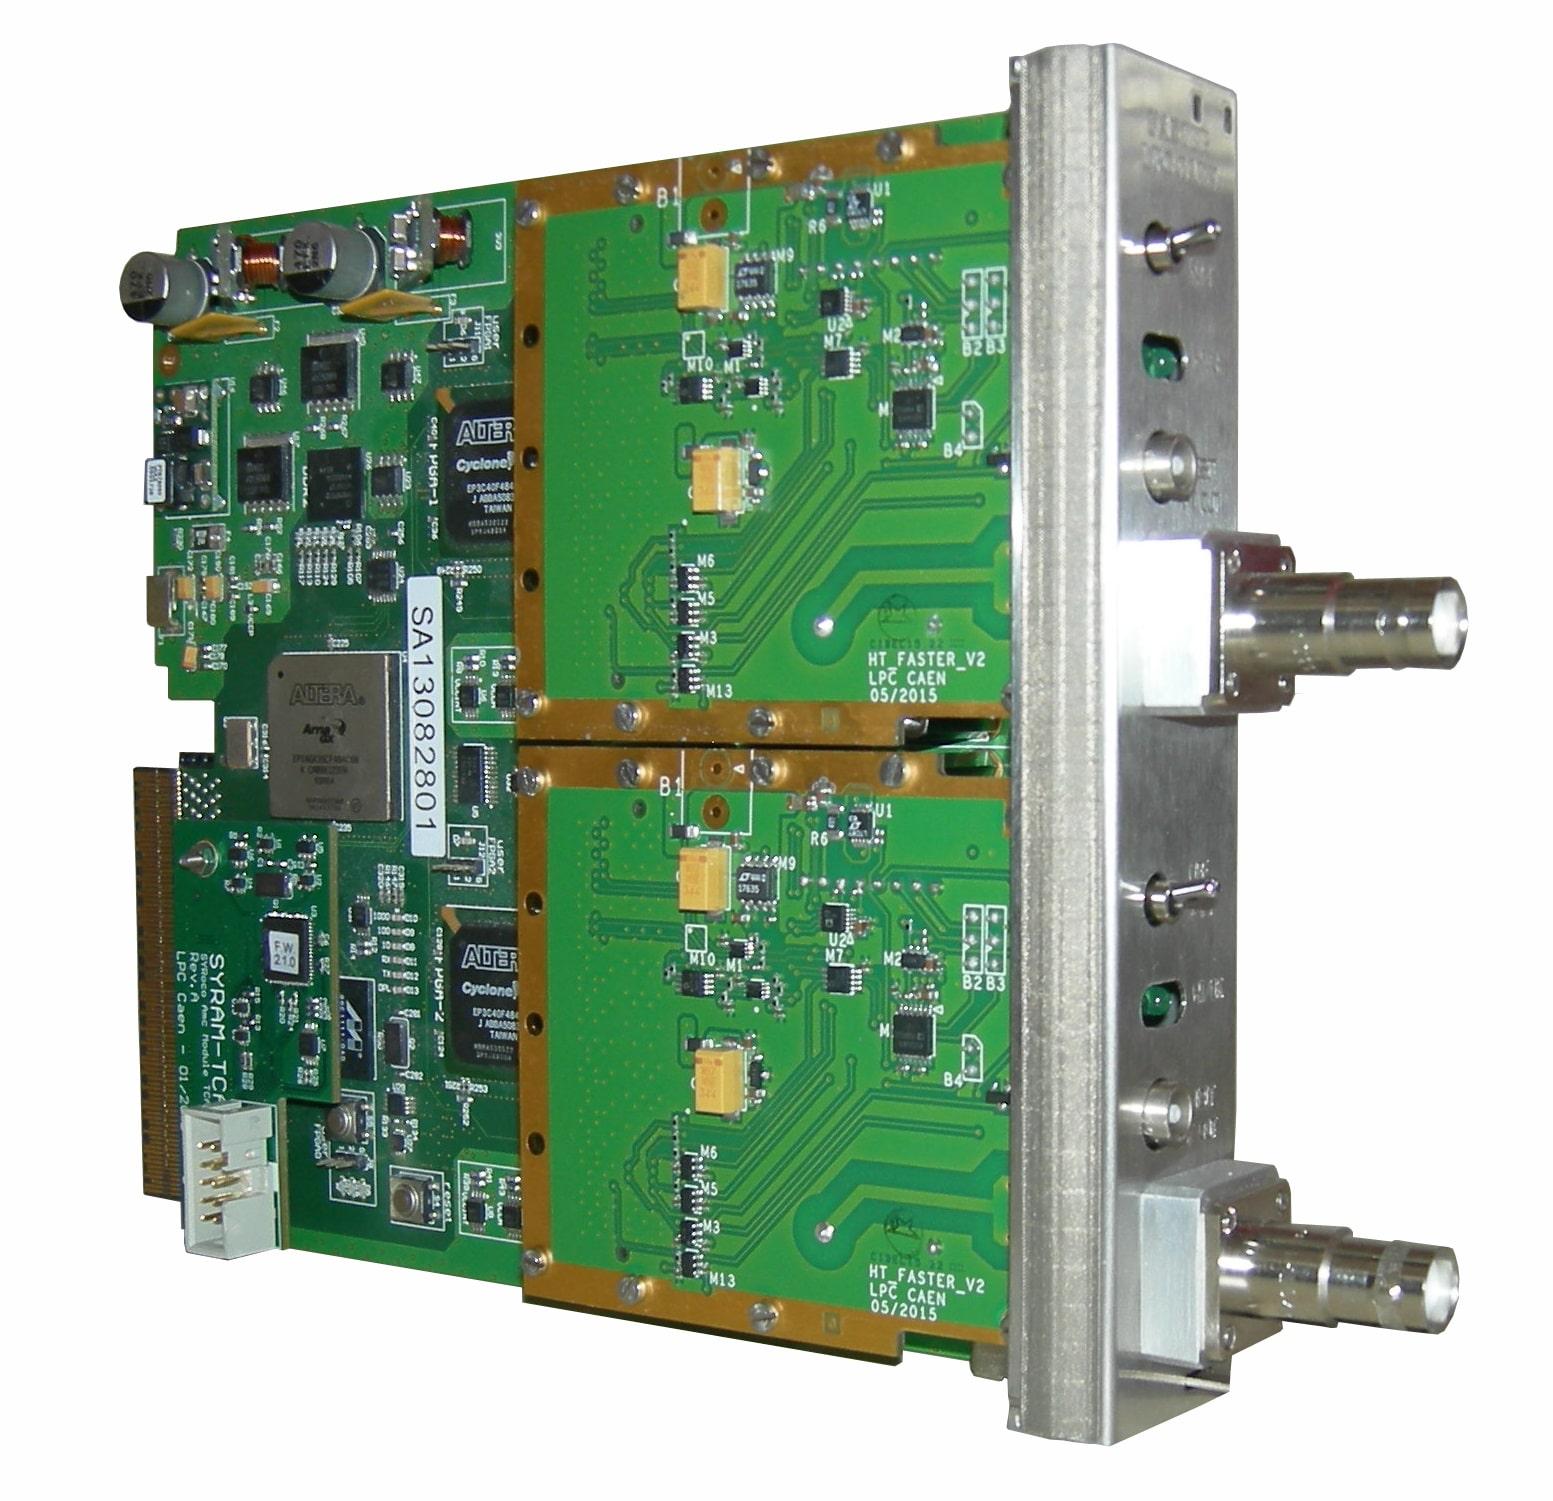 Carte AMC Faster et convertisseur haute tension microTCA d'ISEG serie BPS